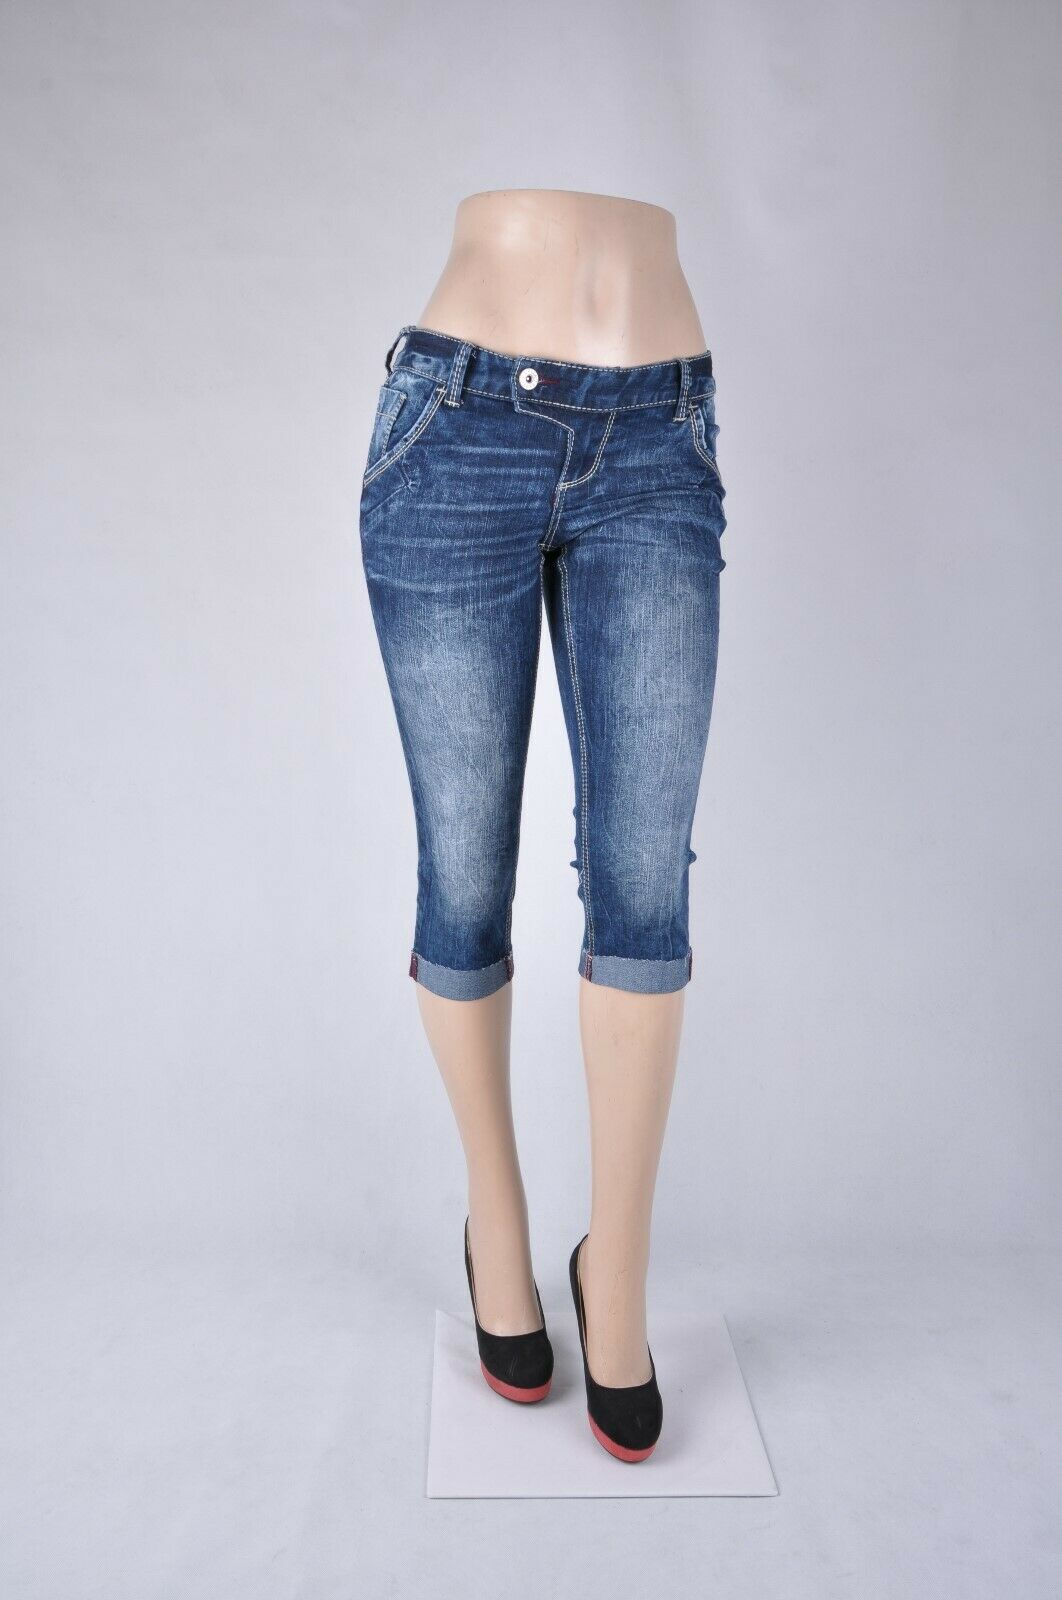 Size 3-15 NWT Junior Stretch Denim Croped Capri Jeans Roll up bottom SG-25779